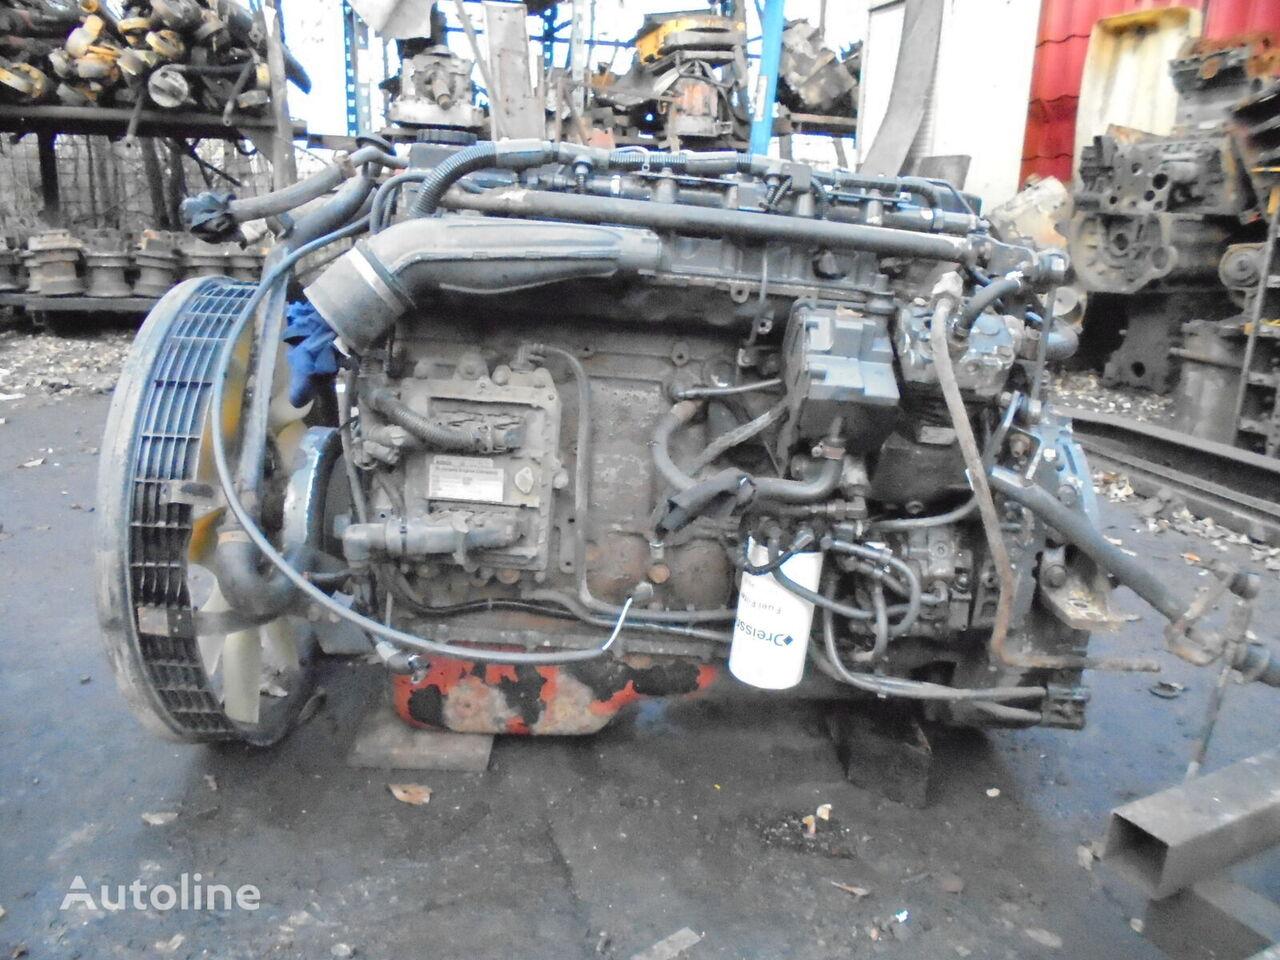 CUMMINS ISBE185 30 engine for wheel loader